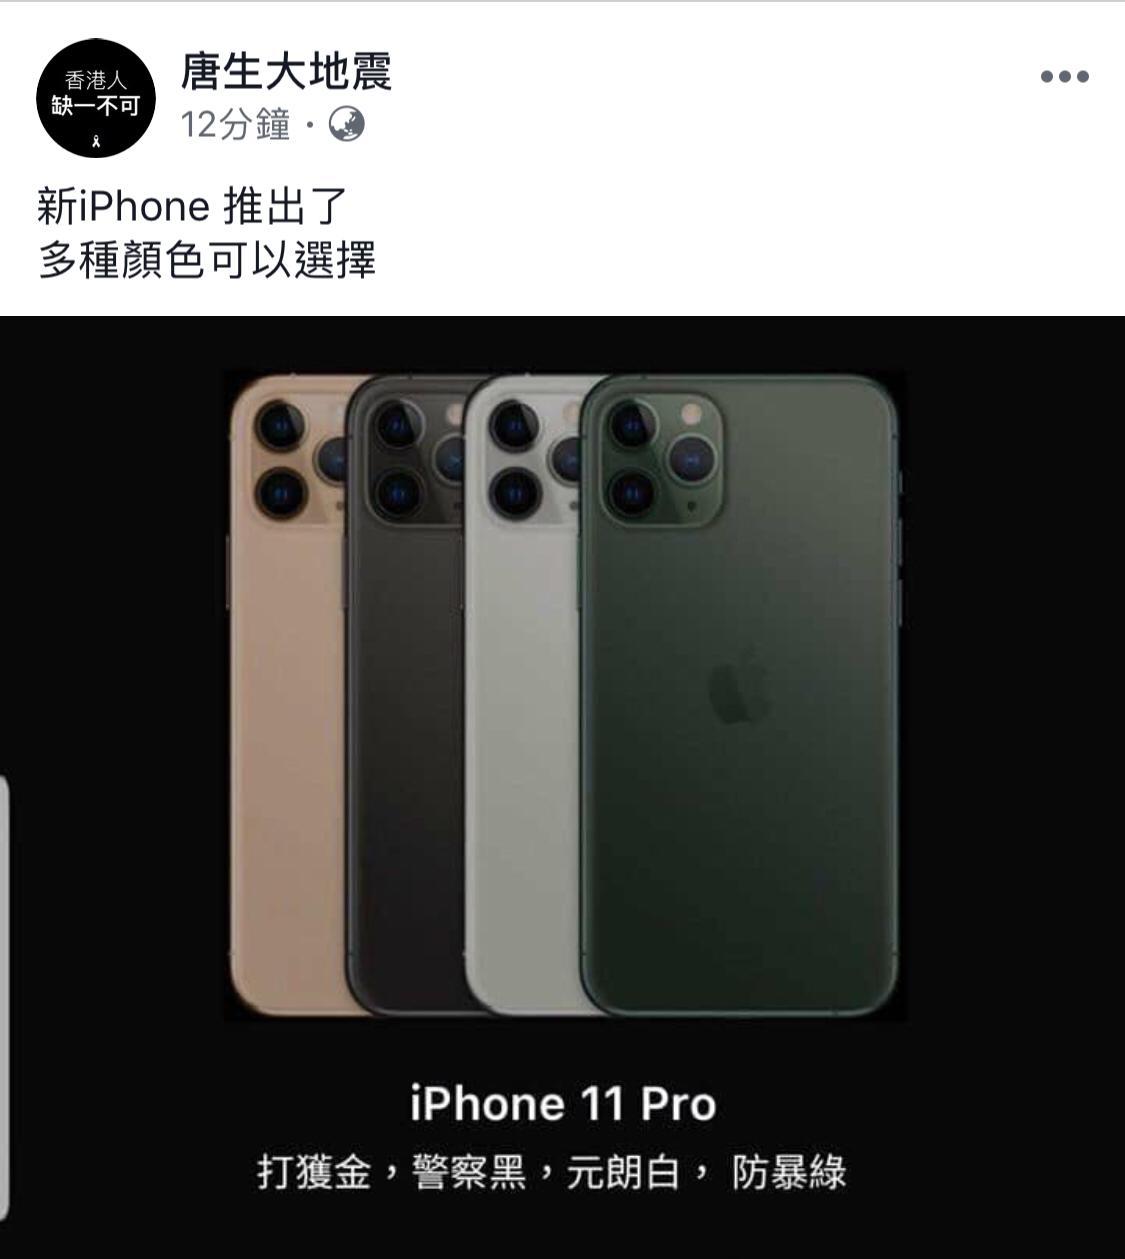 https://upload.cc/i1/2019/09/11/ERhmeQ.png